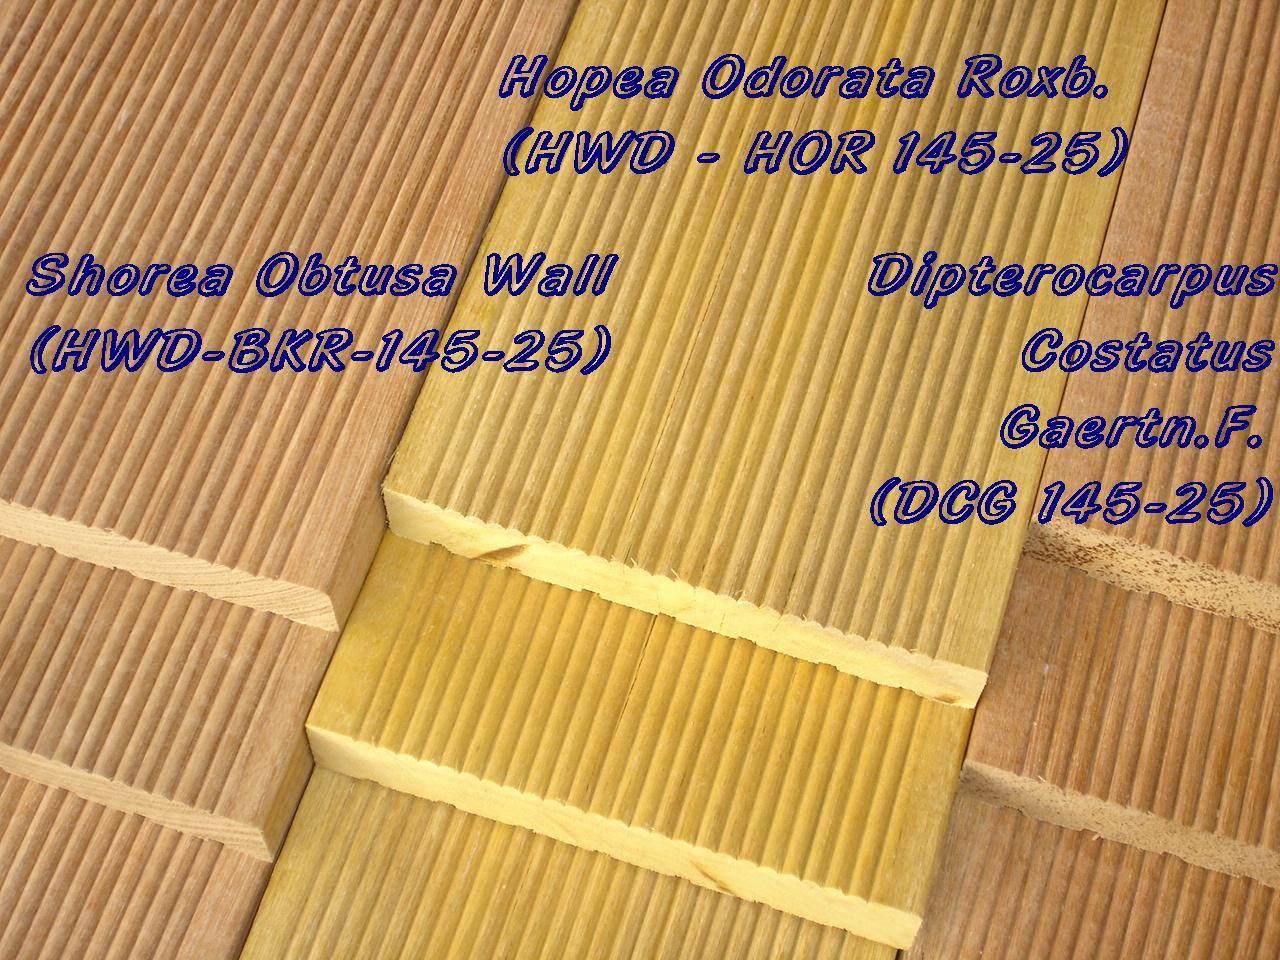 Tropical Hard Wood Reeded Deck Bangkirai Keruing